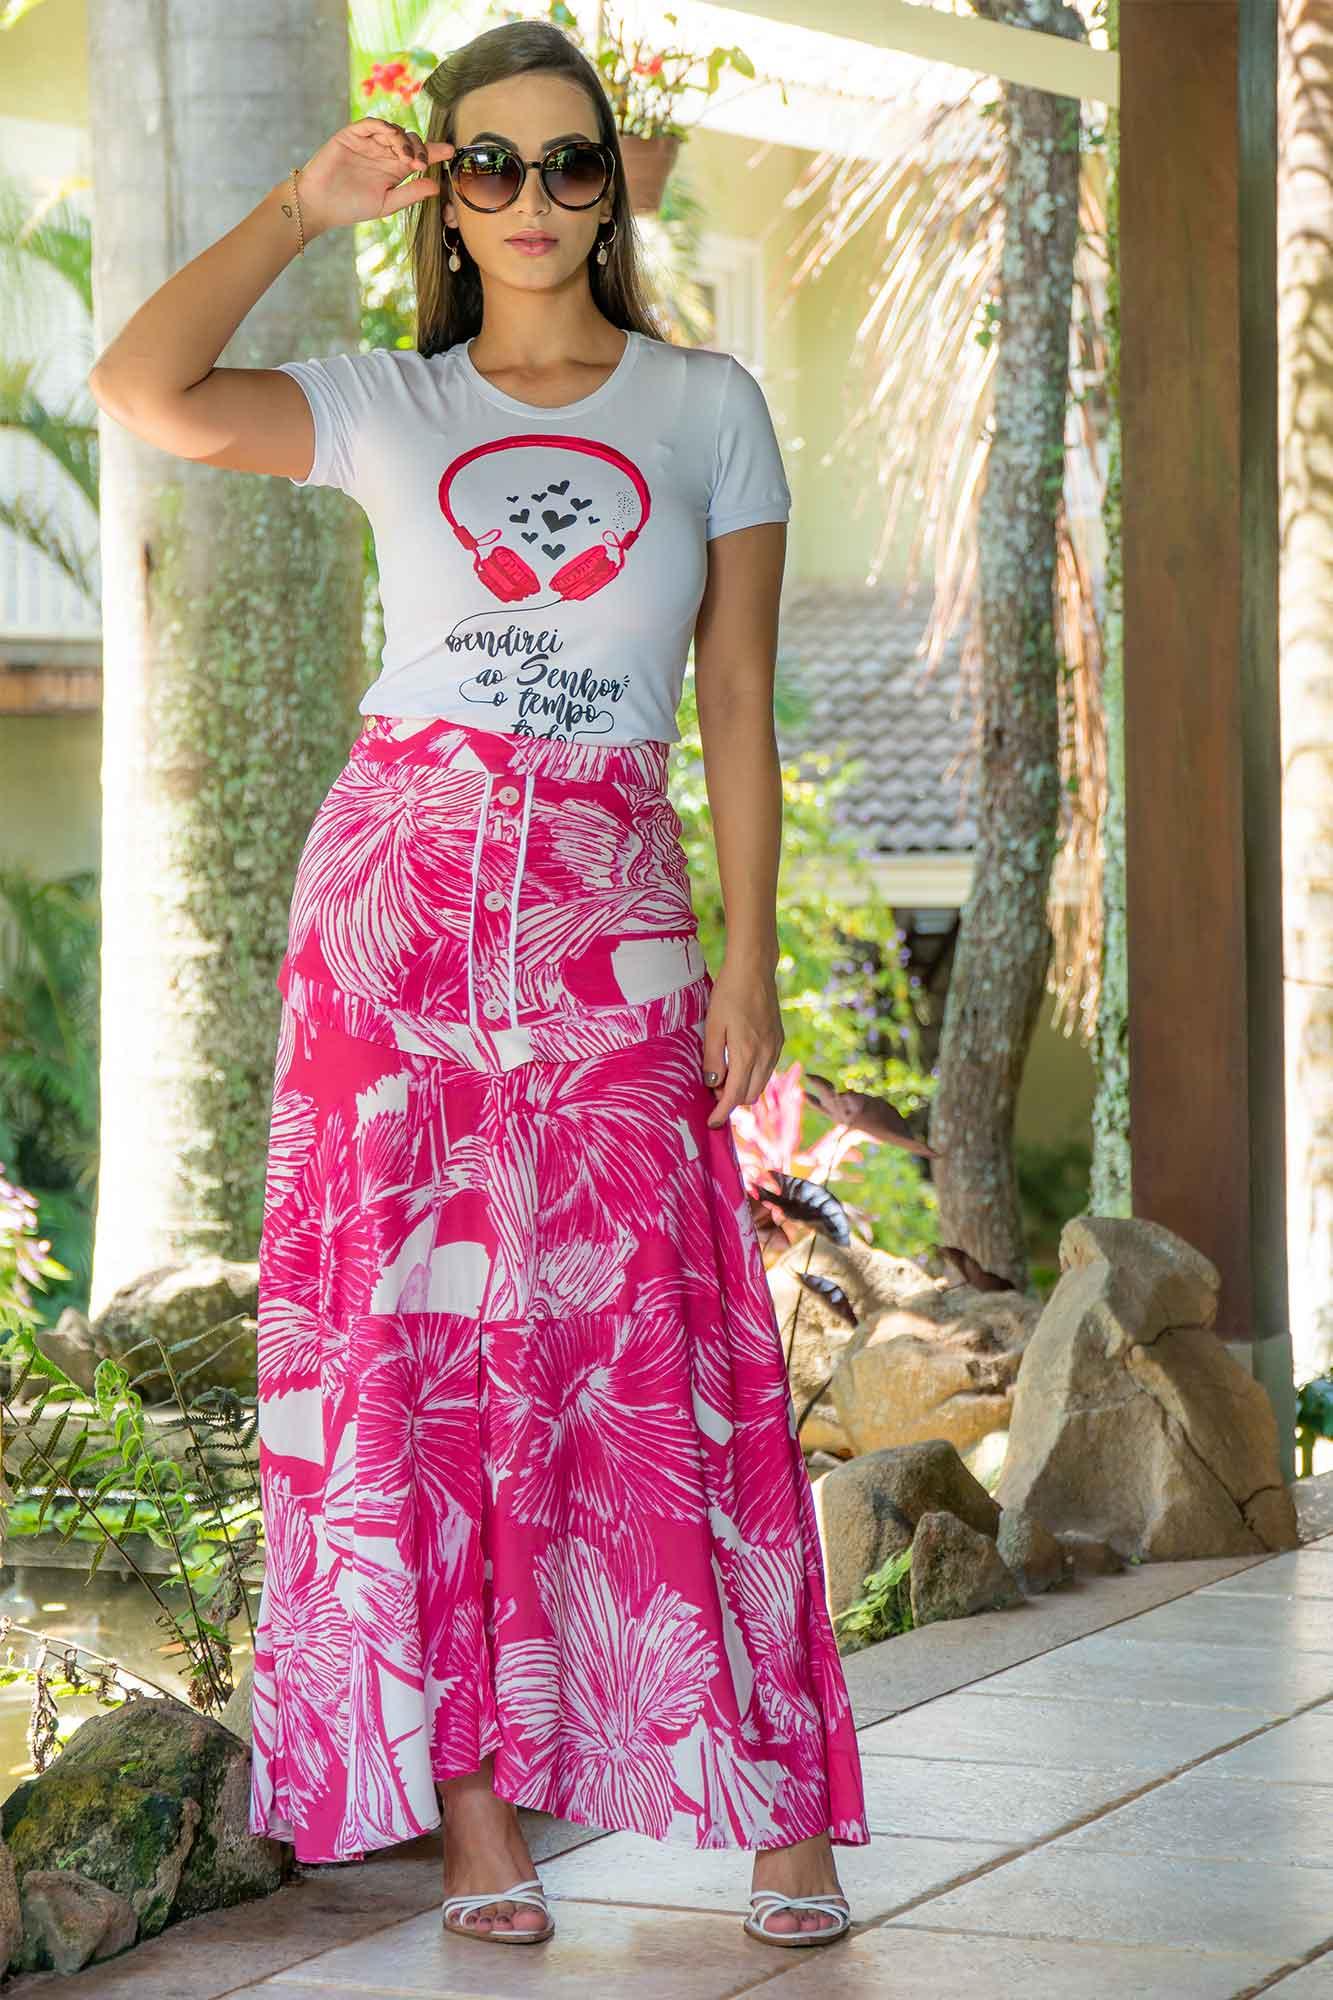 T-SHIRT LUCIANA PAIS EM MALHA 92964